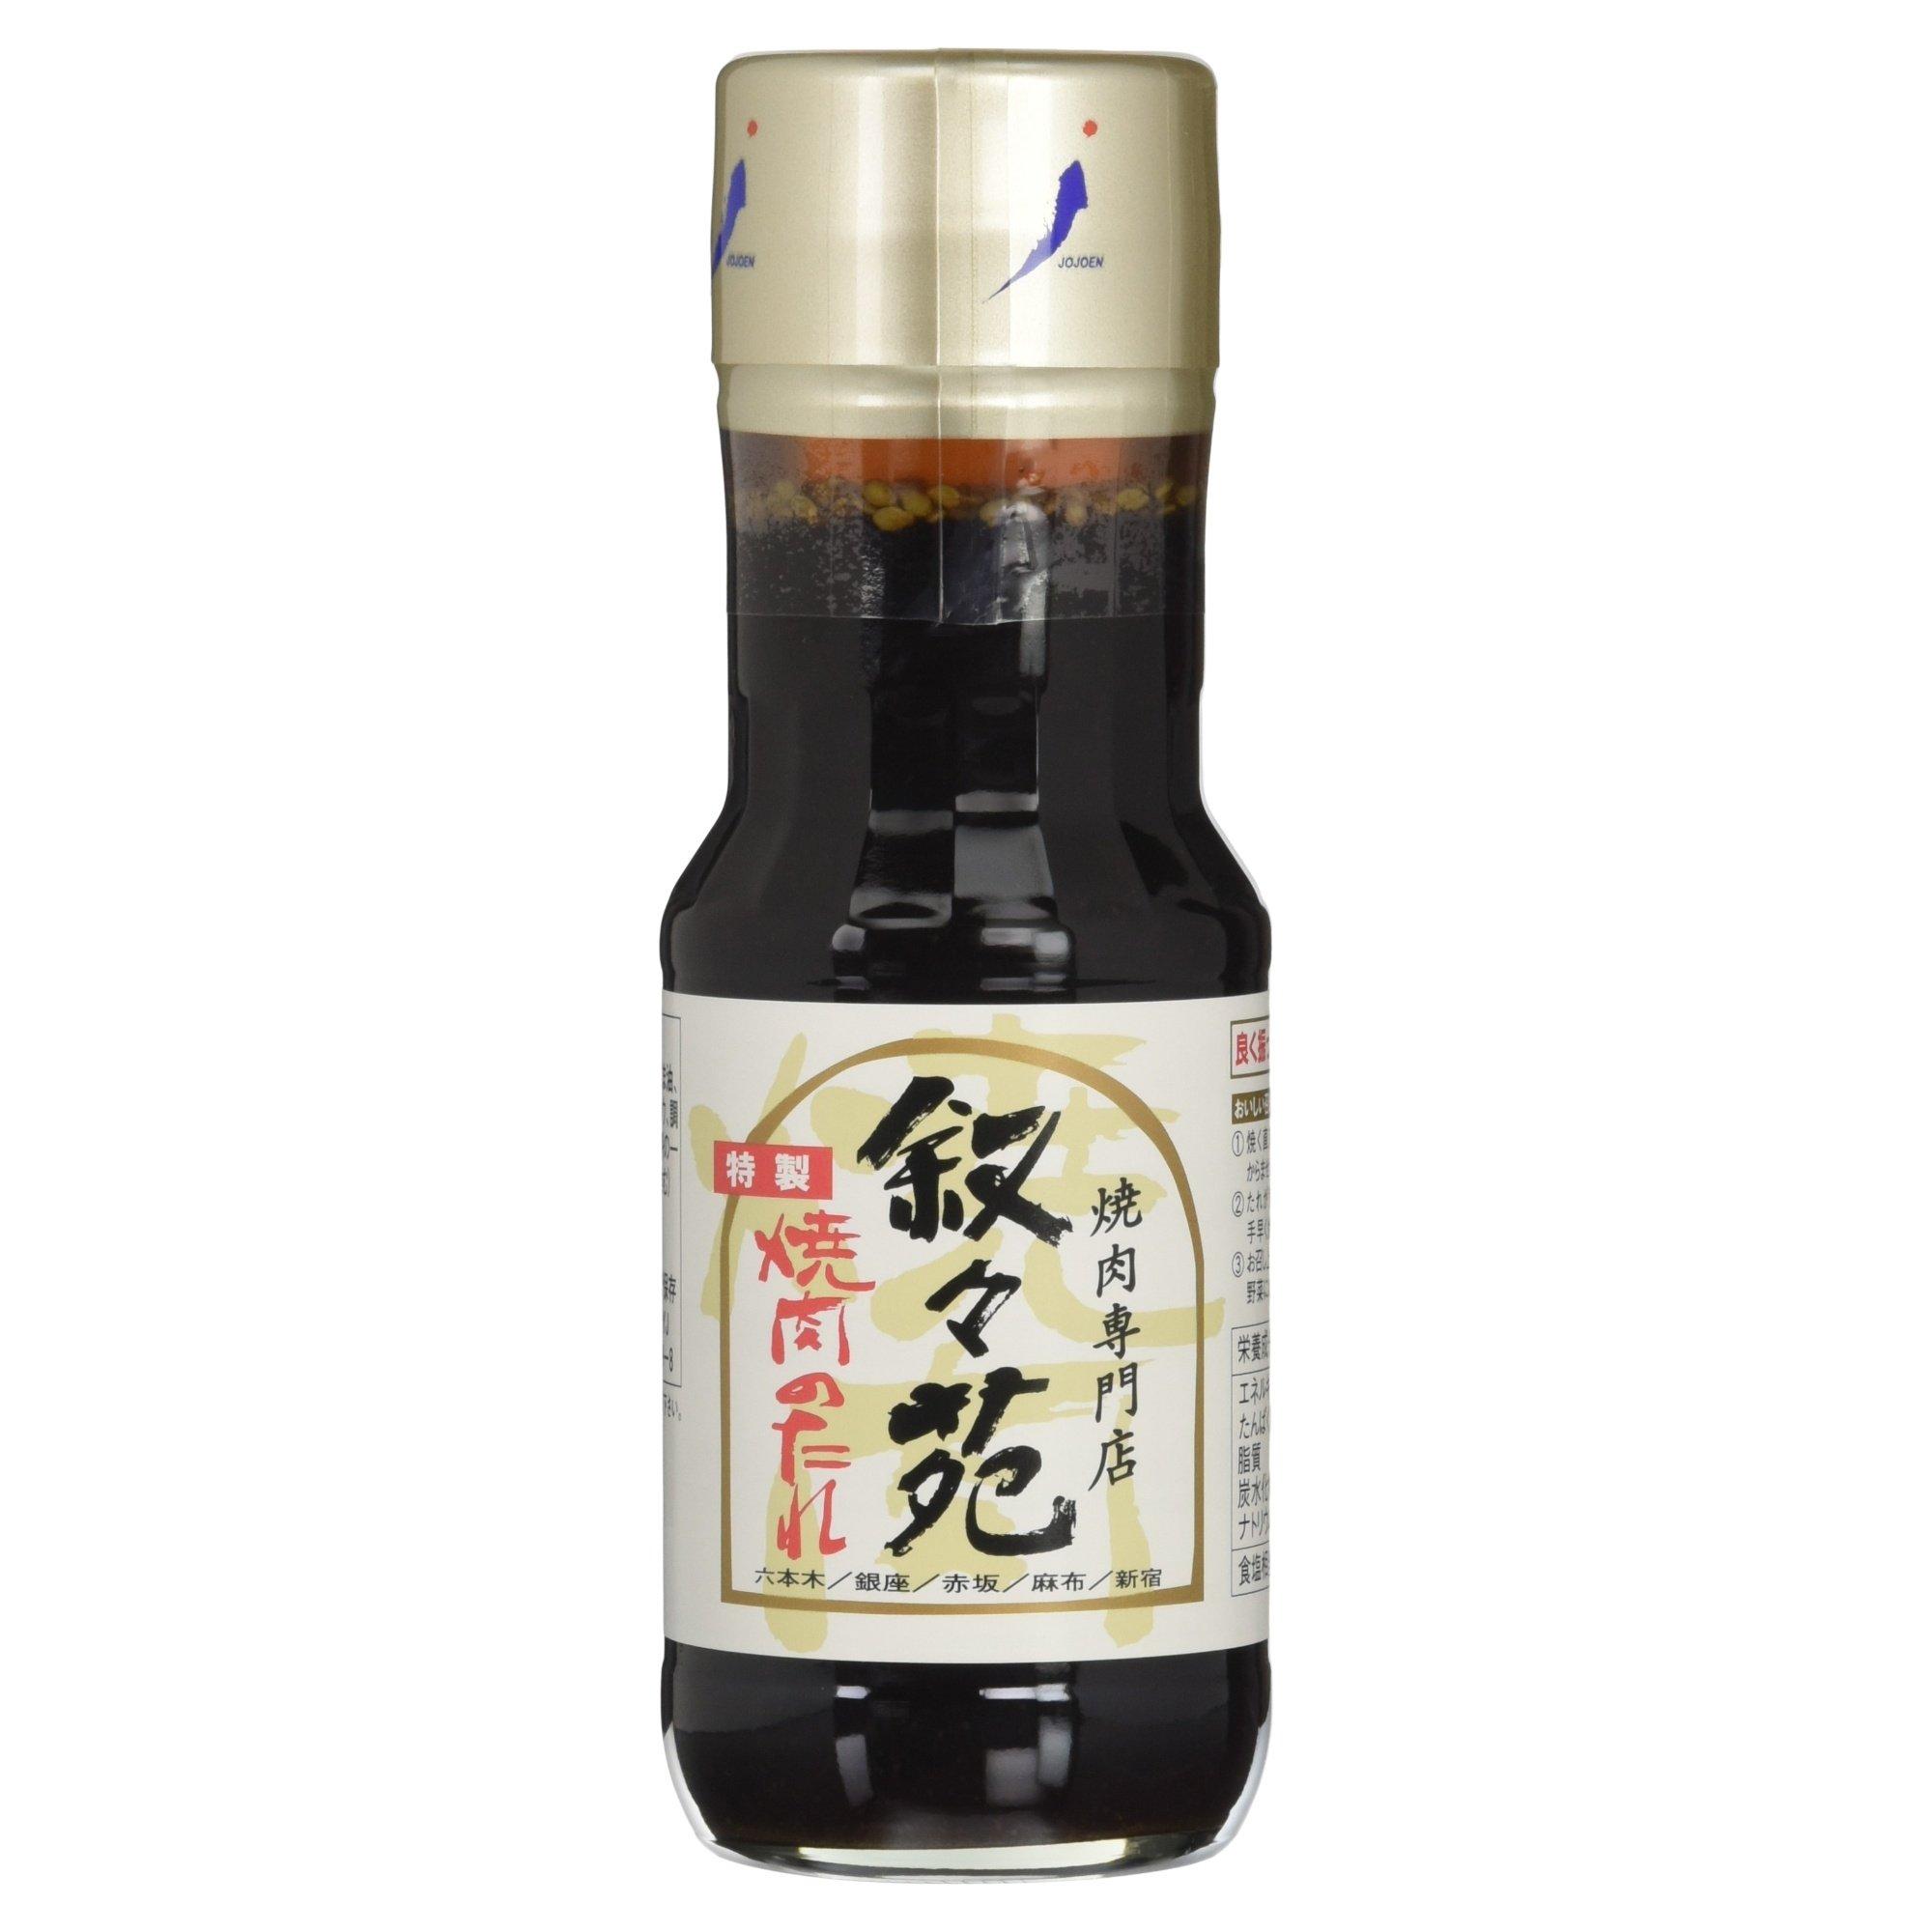 Jojoen Yakiniku Barbecue Sauce Special Made 240g 8.5oz (Japan Import)